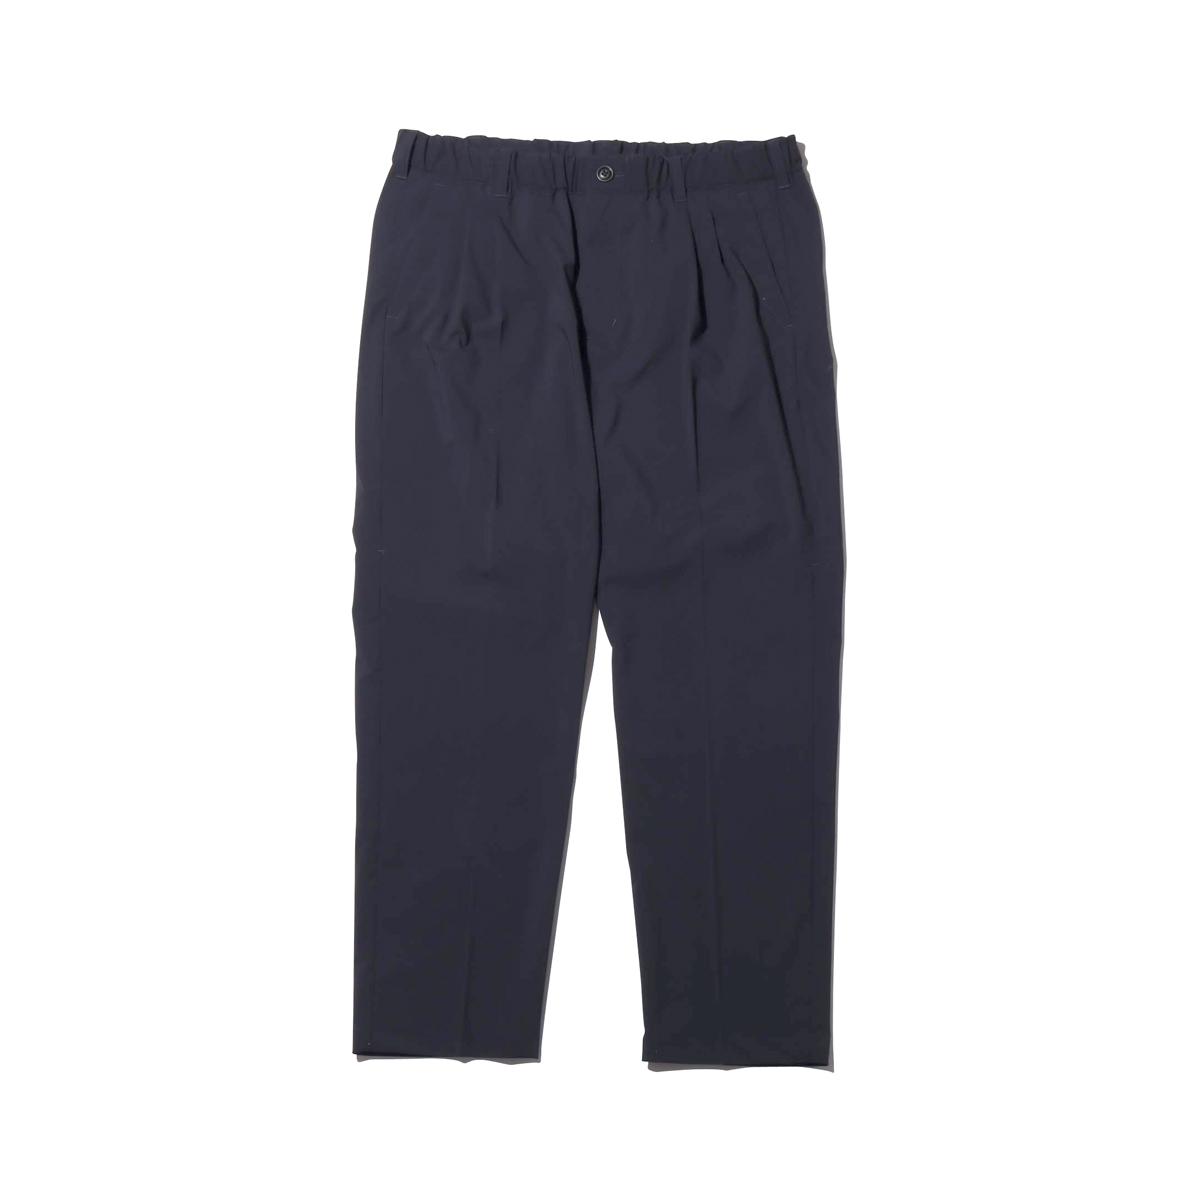 DC SHOES DCBA 19 SLACKS PANT (ディーシーシューズ DCBA 19 スラックス パンツ)NAVY【メンズ パンツ】19SS-I